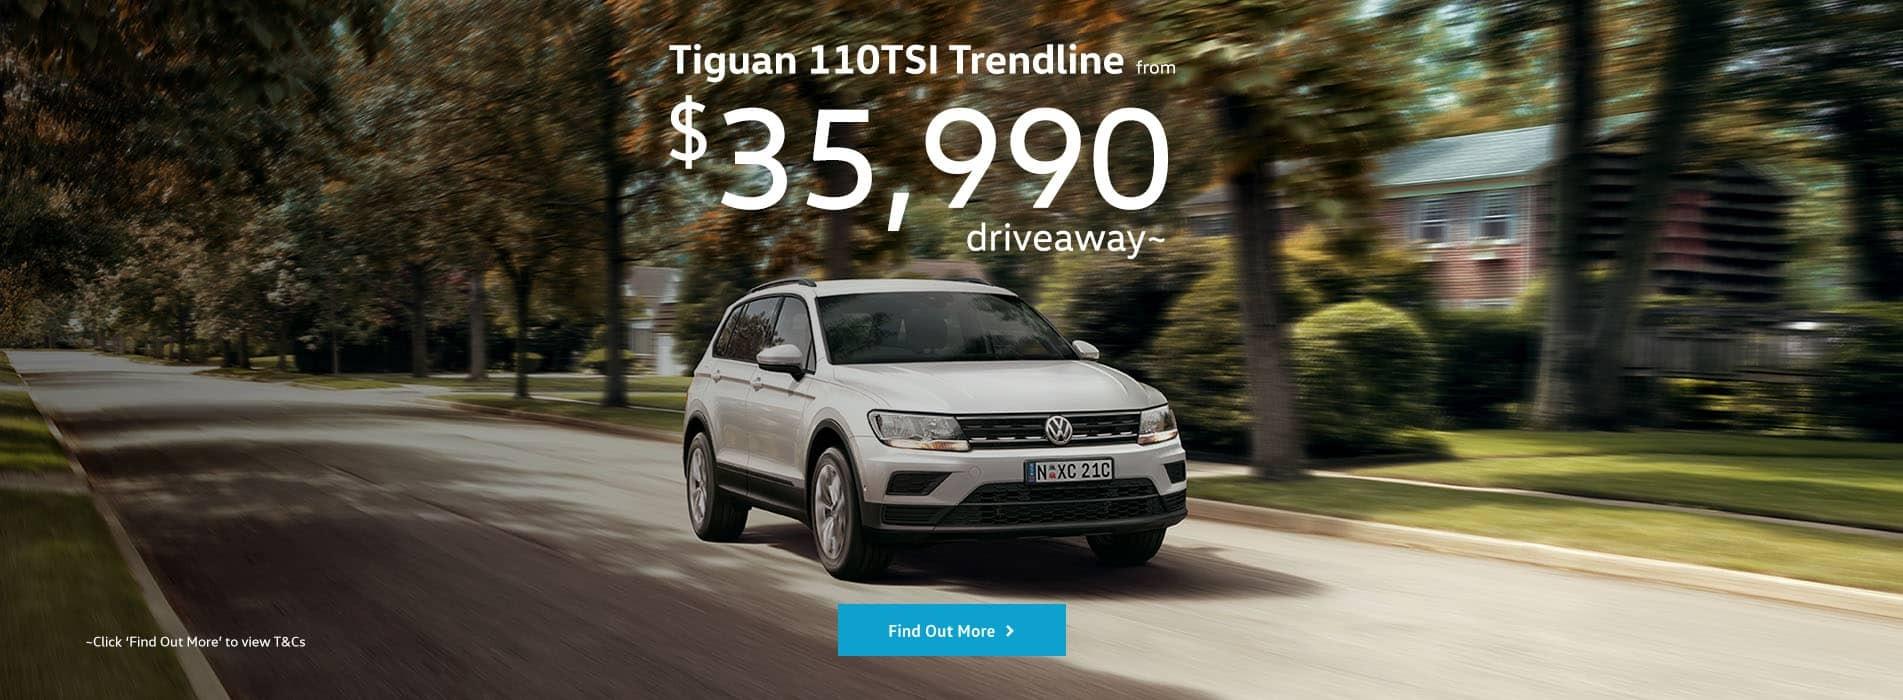 Tiguan 110TSI Trendline Driveaway Offer